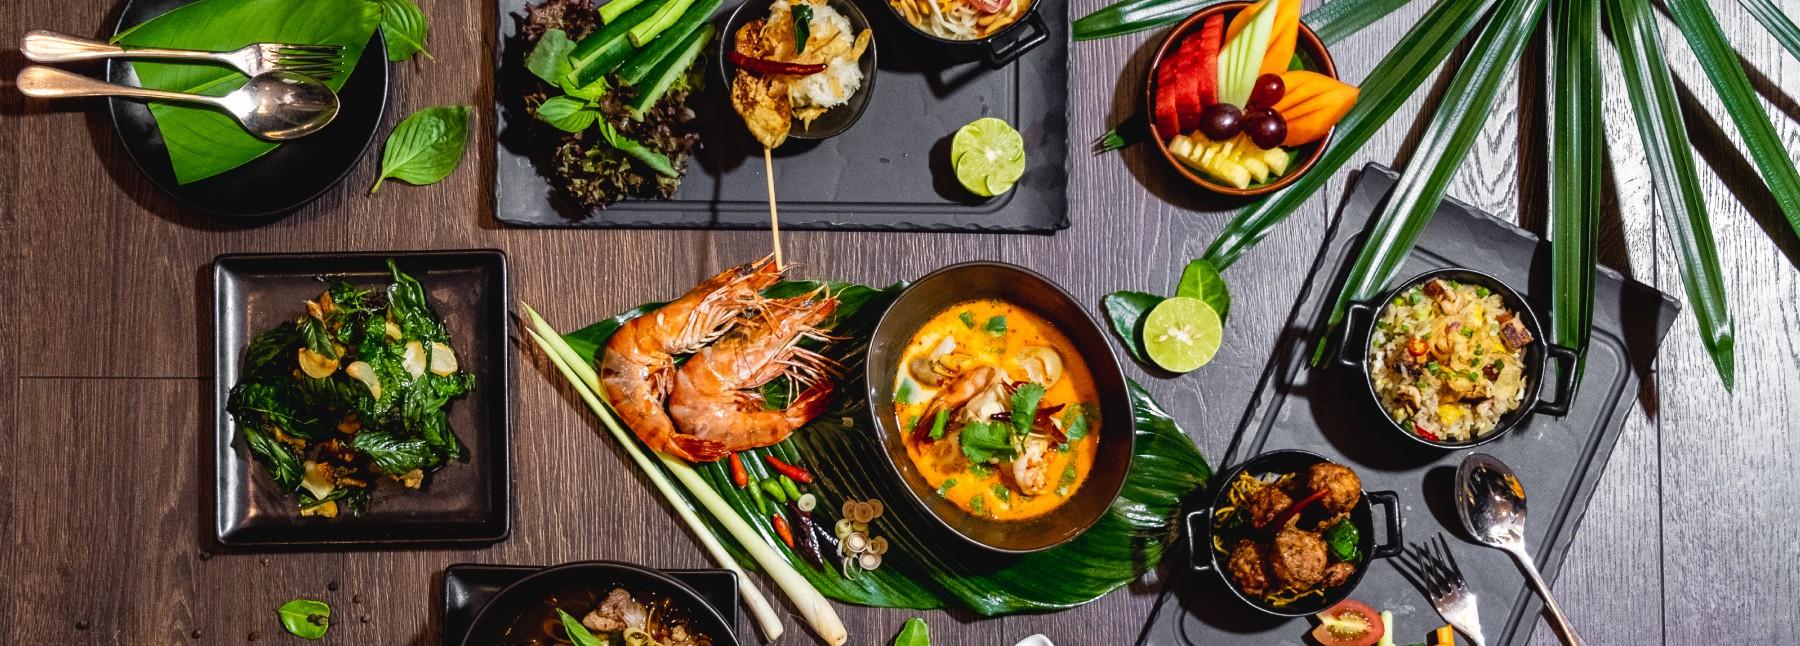 thai-style-dinner-set